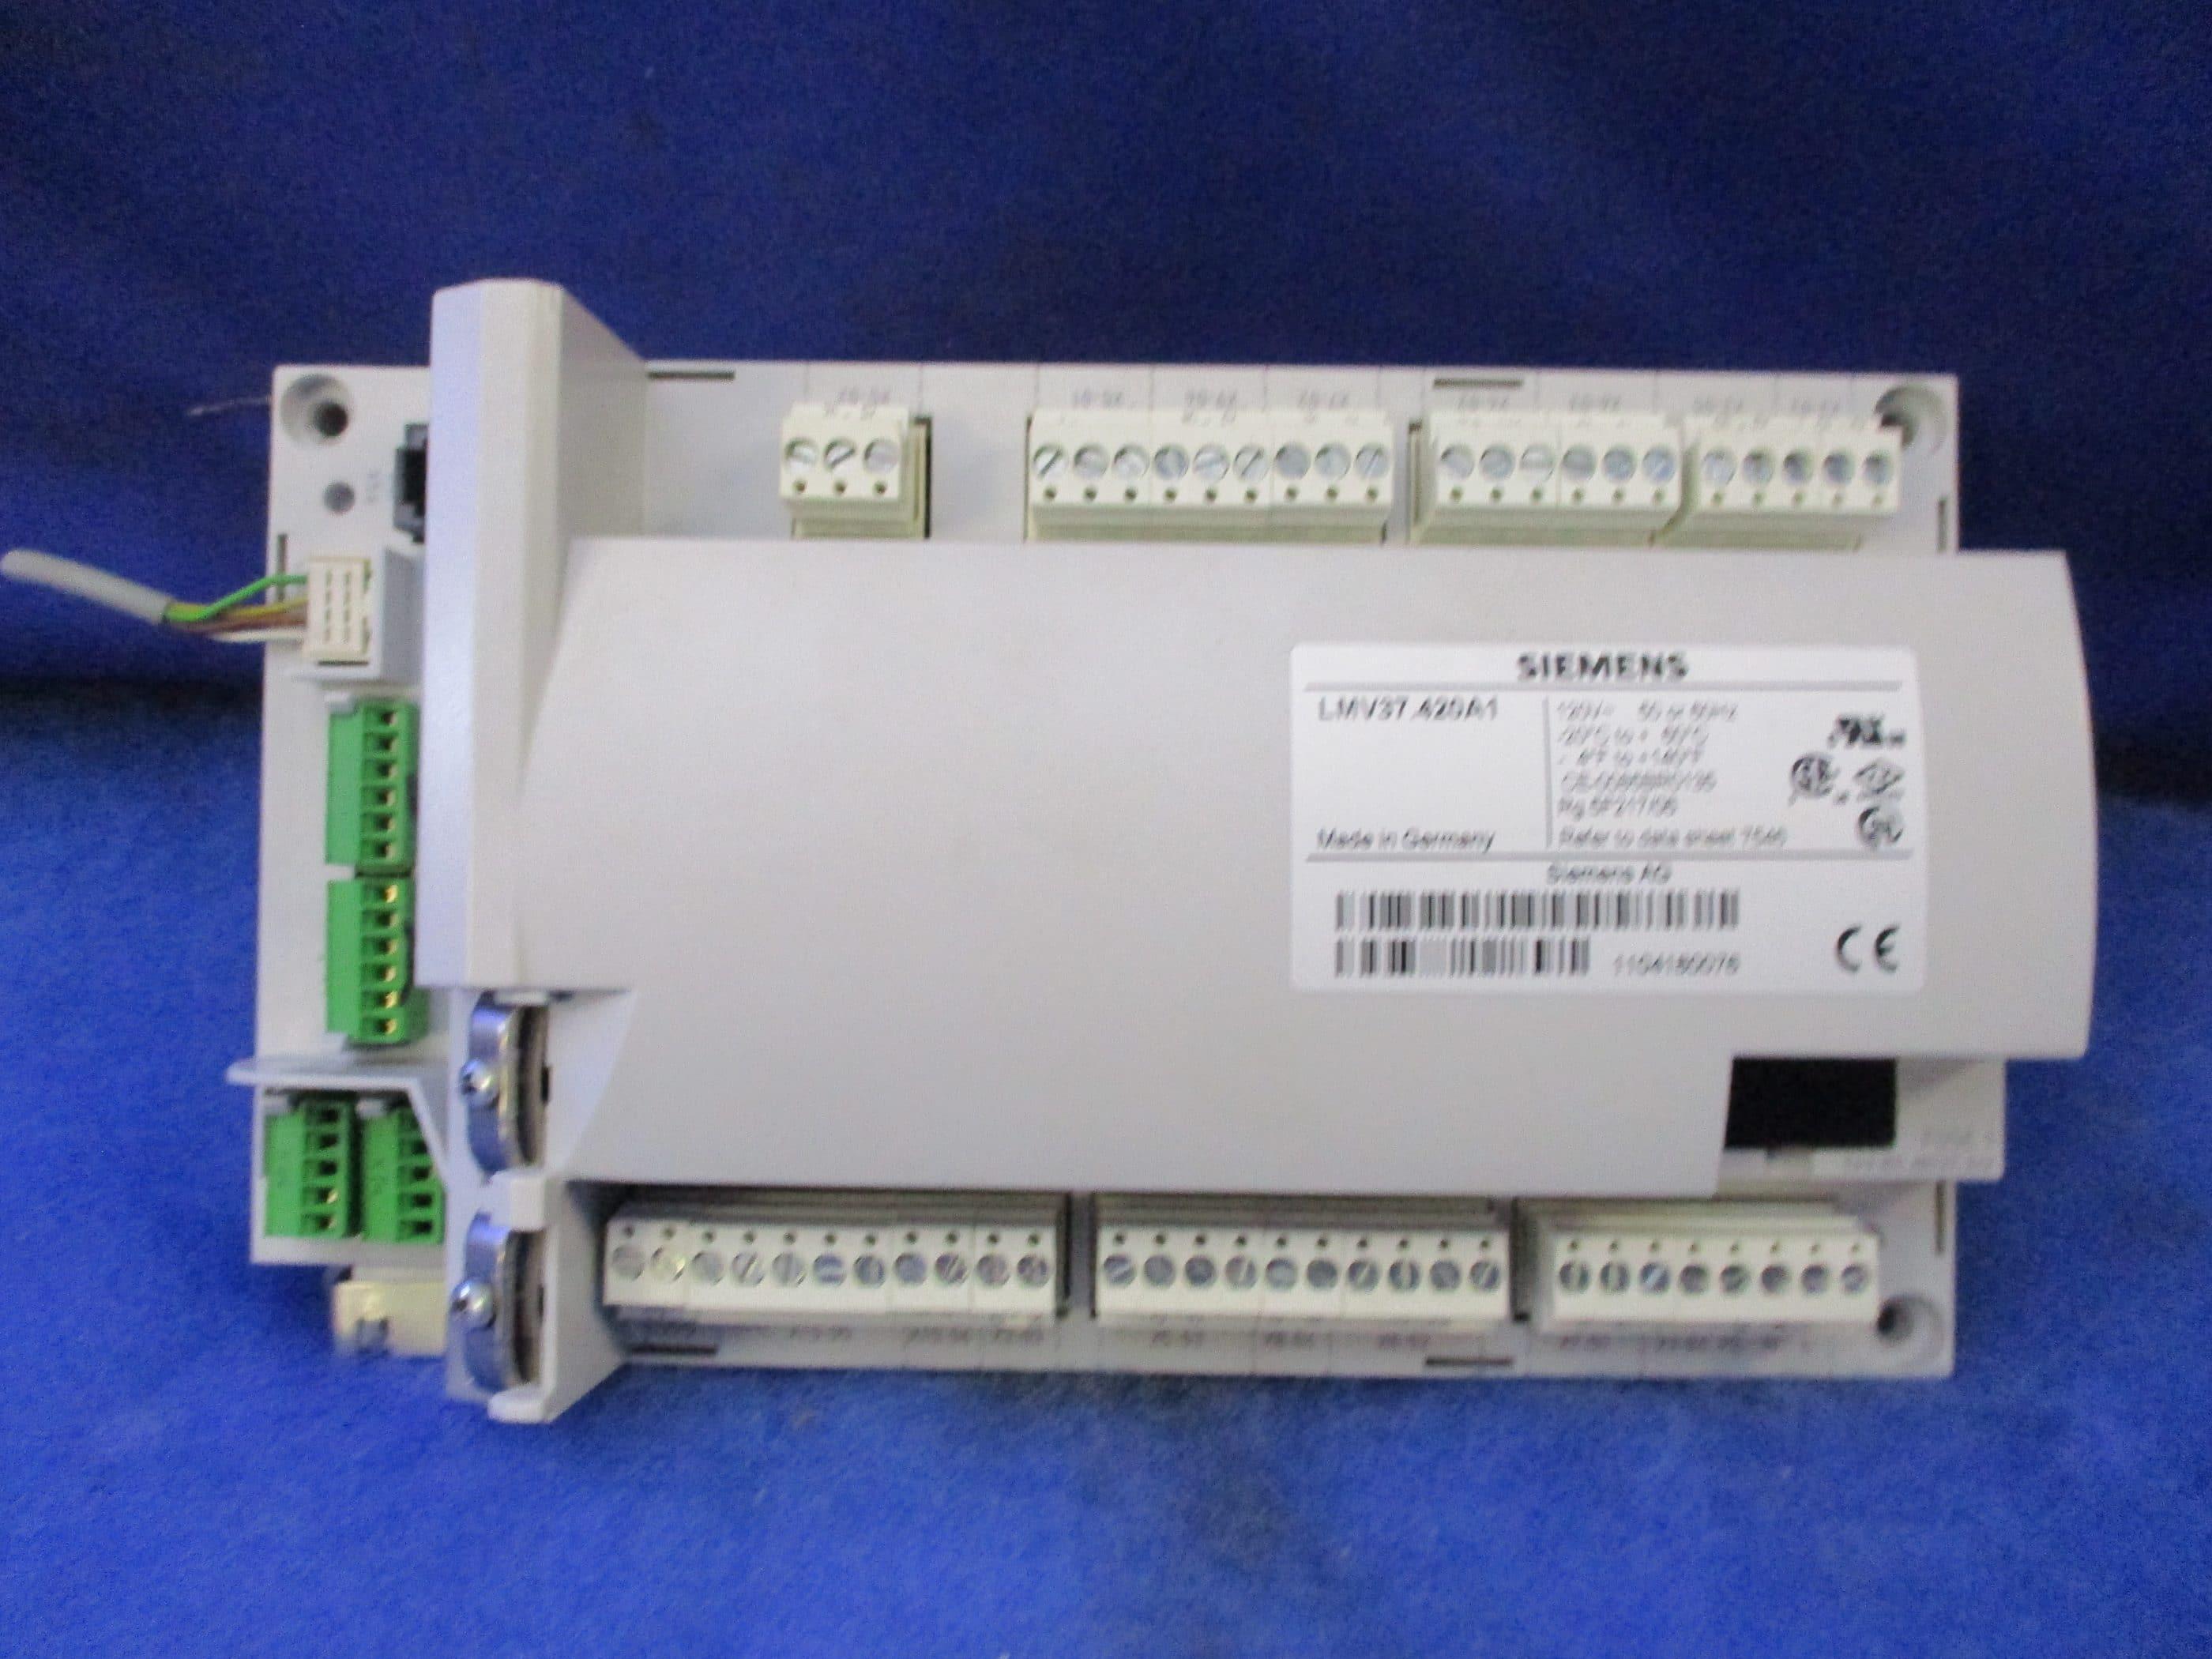 Details about SIEMENS LMV37 420A 1 Burner Controller 1 year warranty